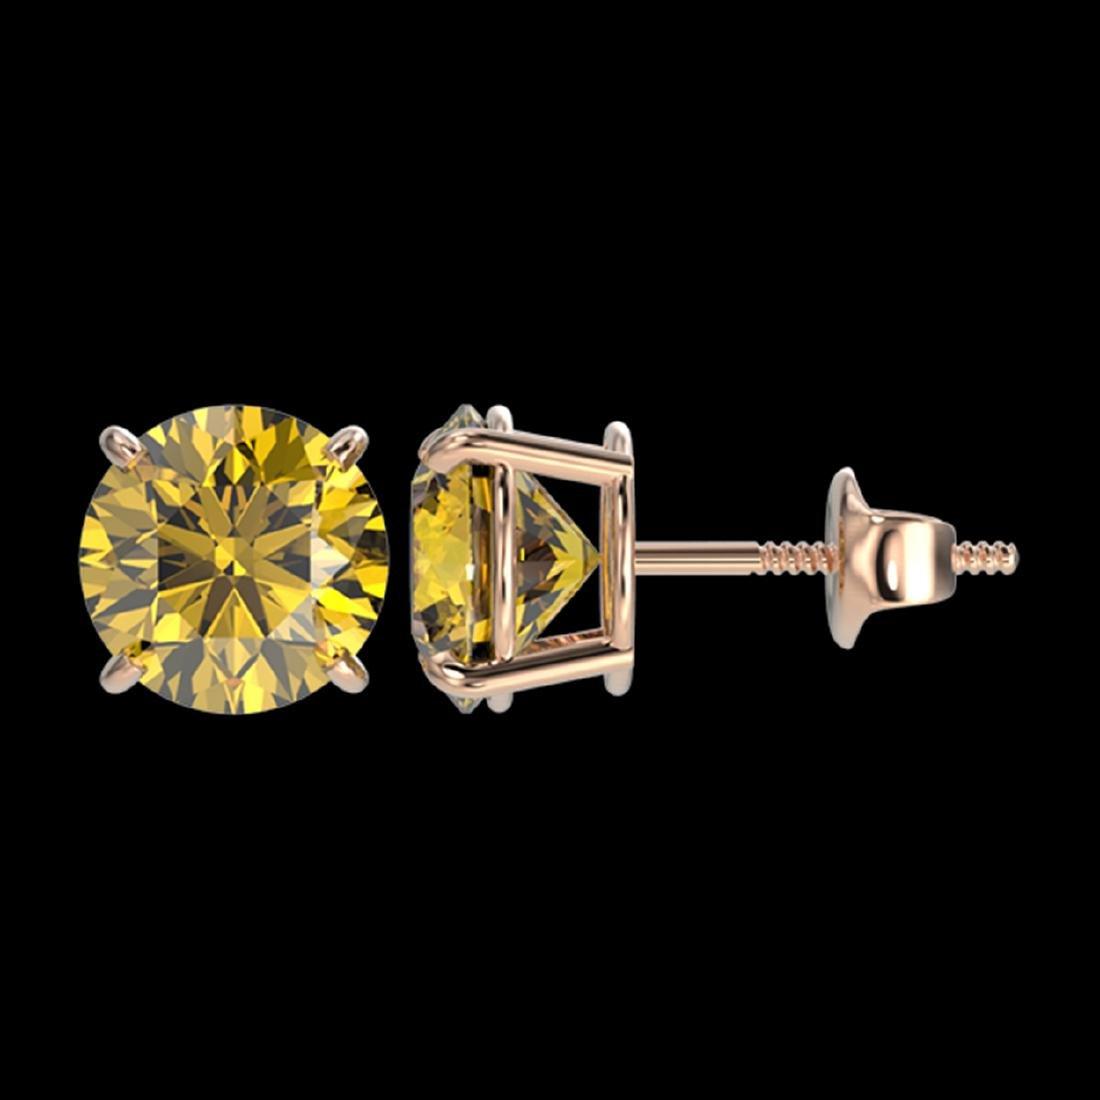 2.50 ctw Intense Yellow Diamond Stud Earrings 10K Rose - 2